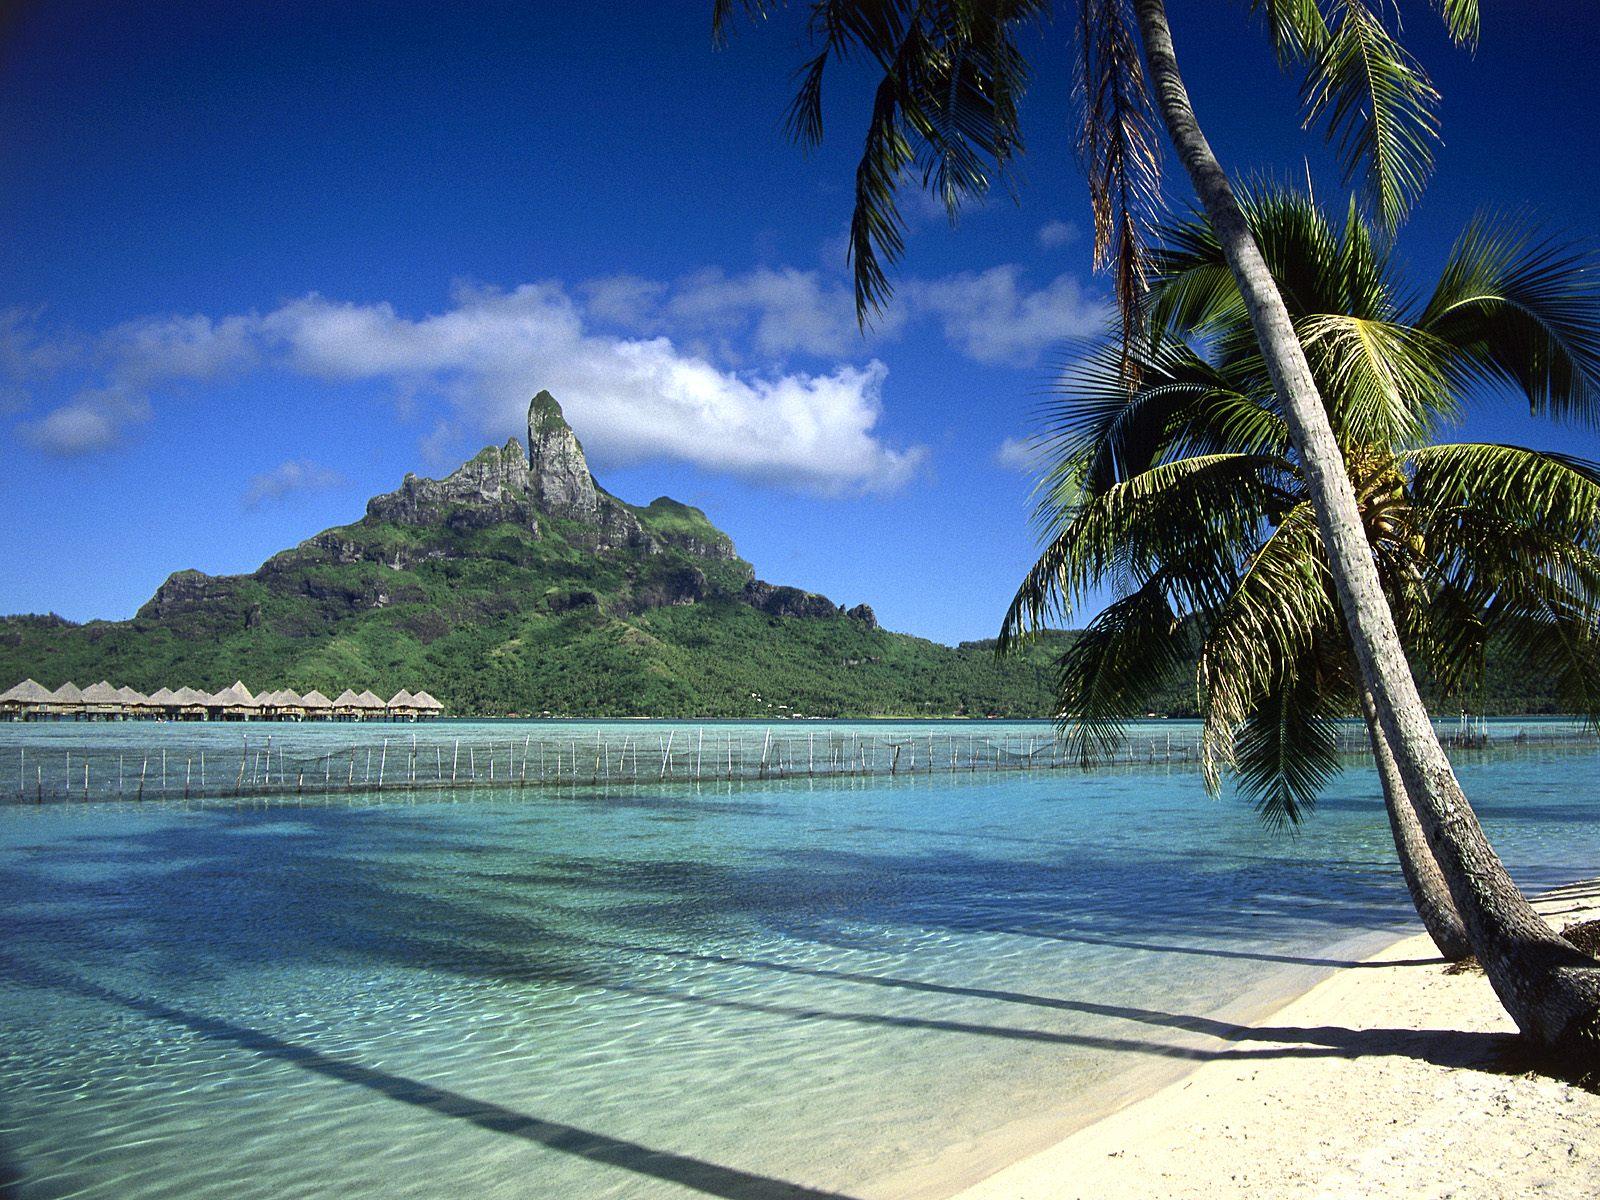 http://1.bp.blogspot.com/_sz2fJjO1XW8/THPeP3OY63I/AAAAAAAAB5o/DTxI9TvZ_ws/s1600/beach_bungalow-1499.jpg